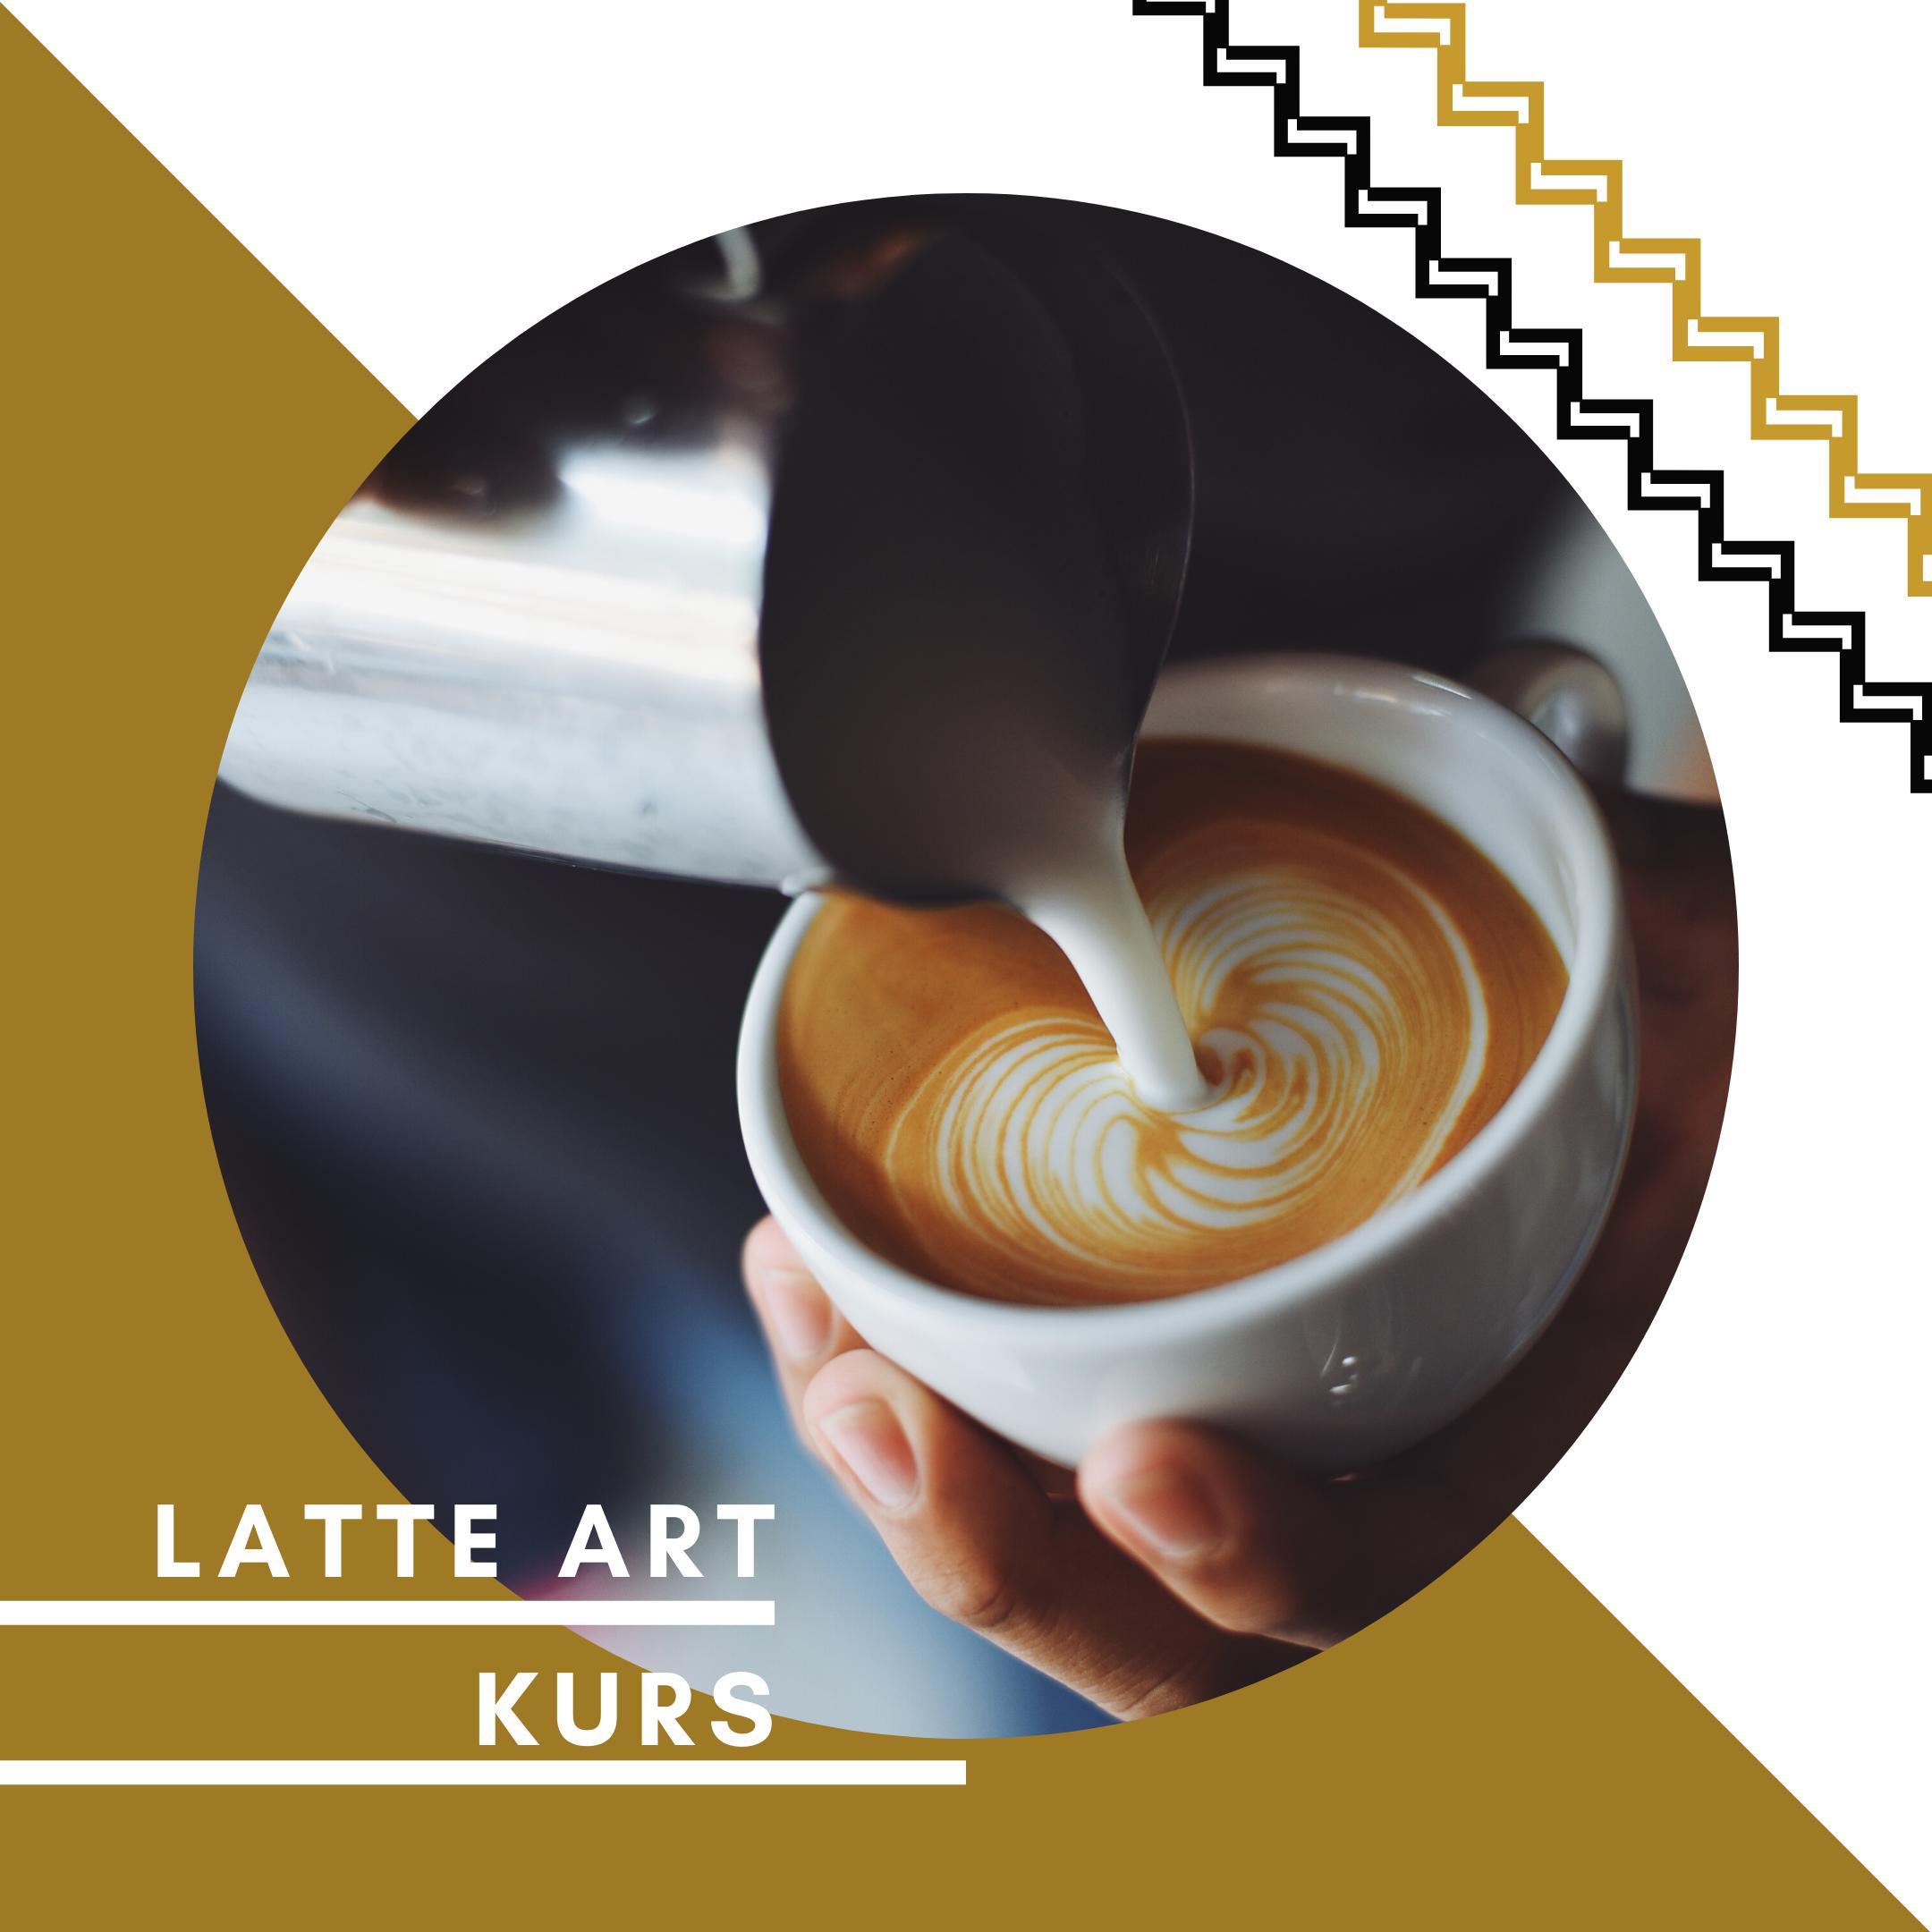 Latte Art Kurs 26. Juni